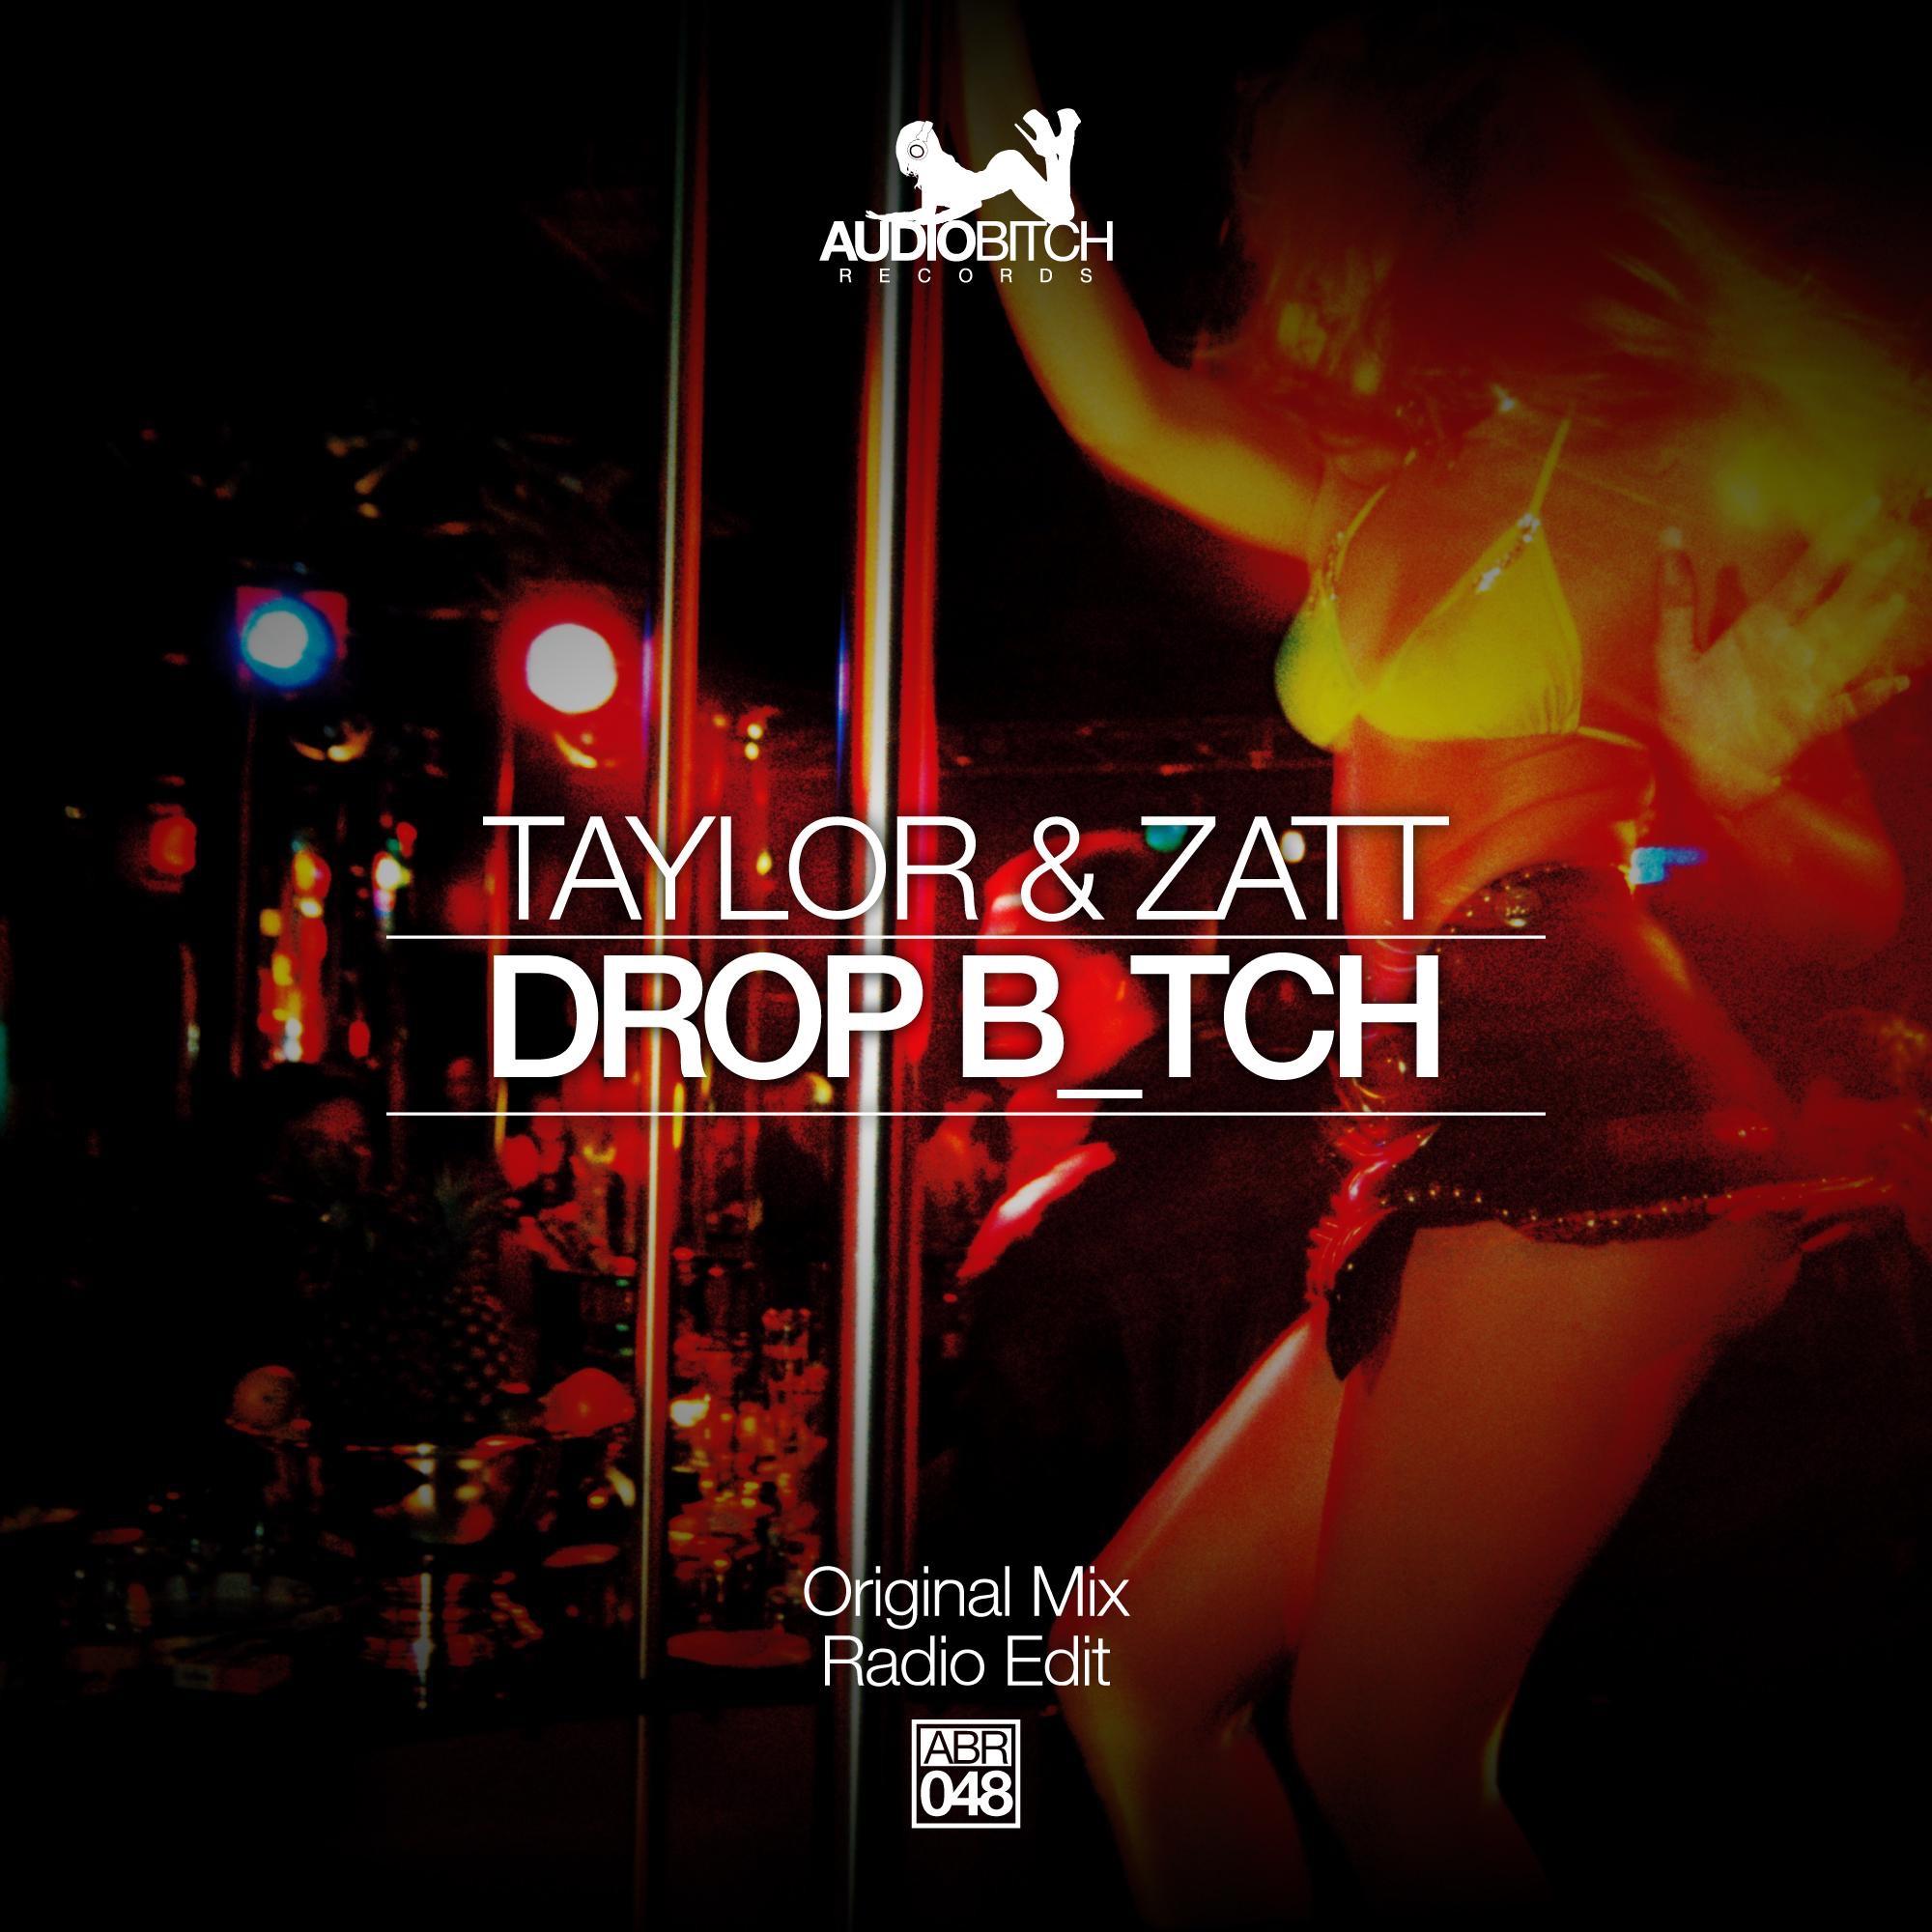 Drop B_tch - Single